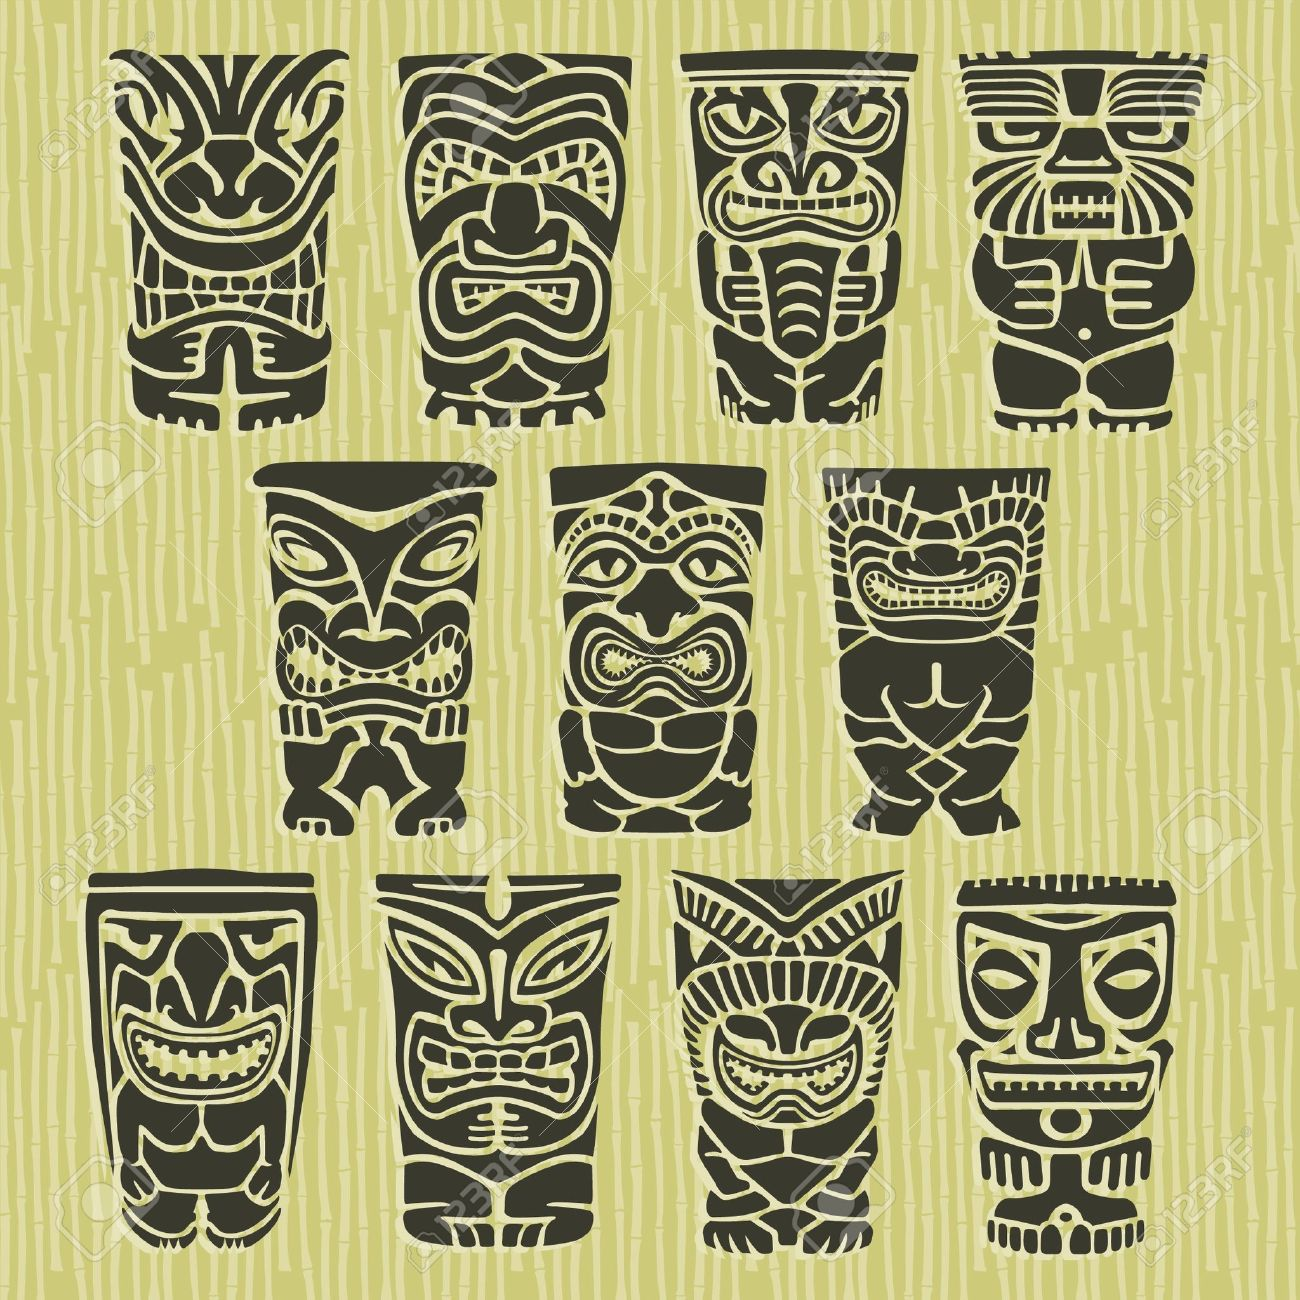 [Jeu] Association d'images - Page 18 17121839-tiki-tribal-native-island-totems-tiki-totem-polynesian